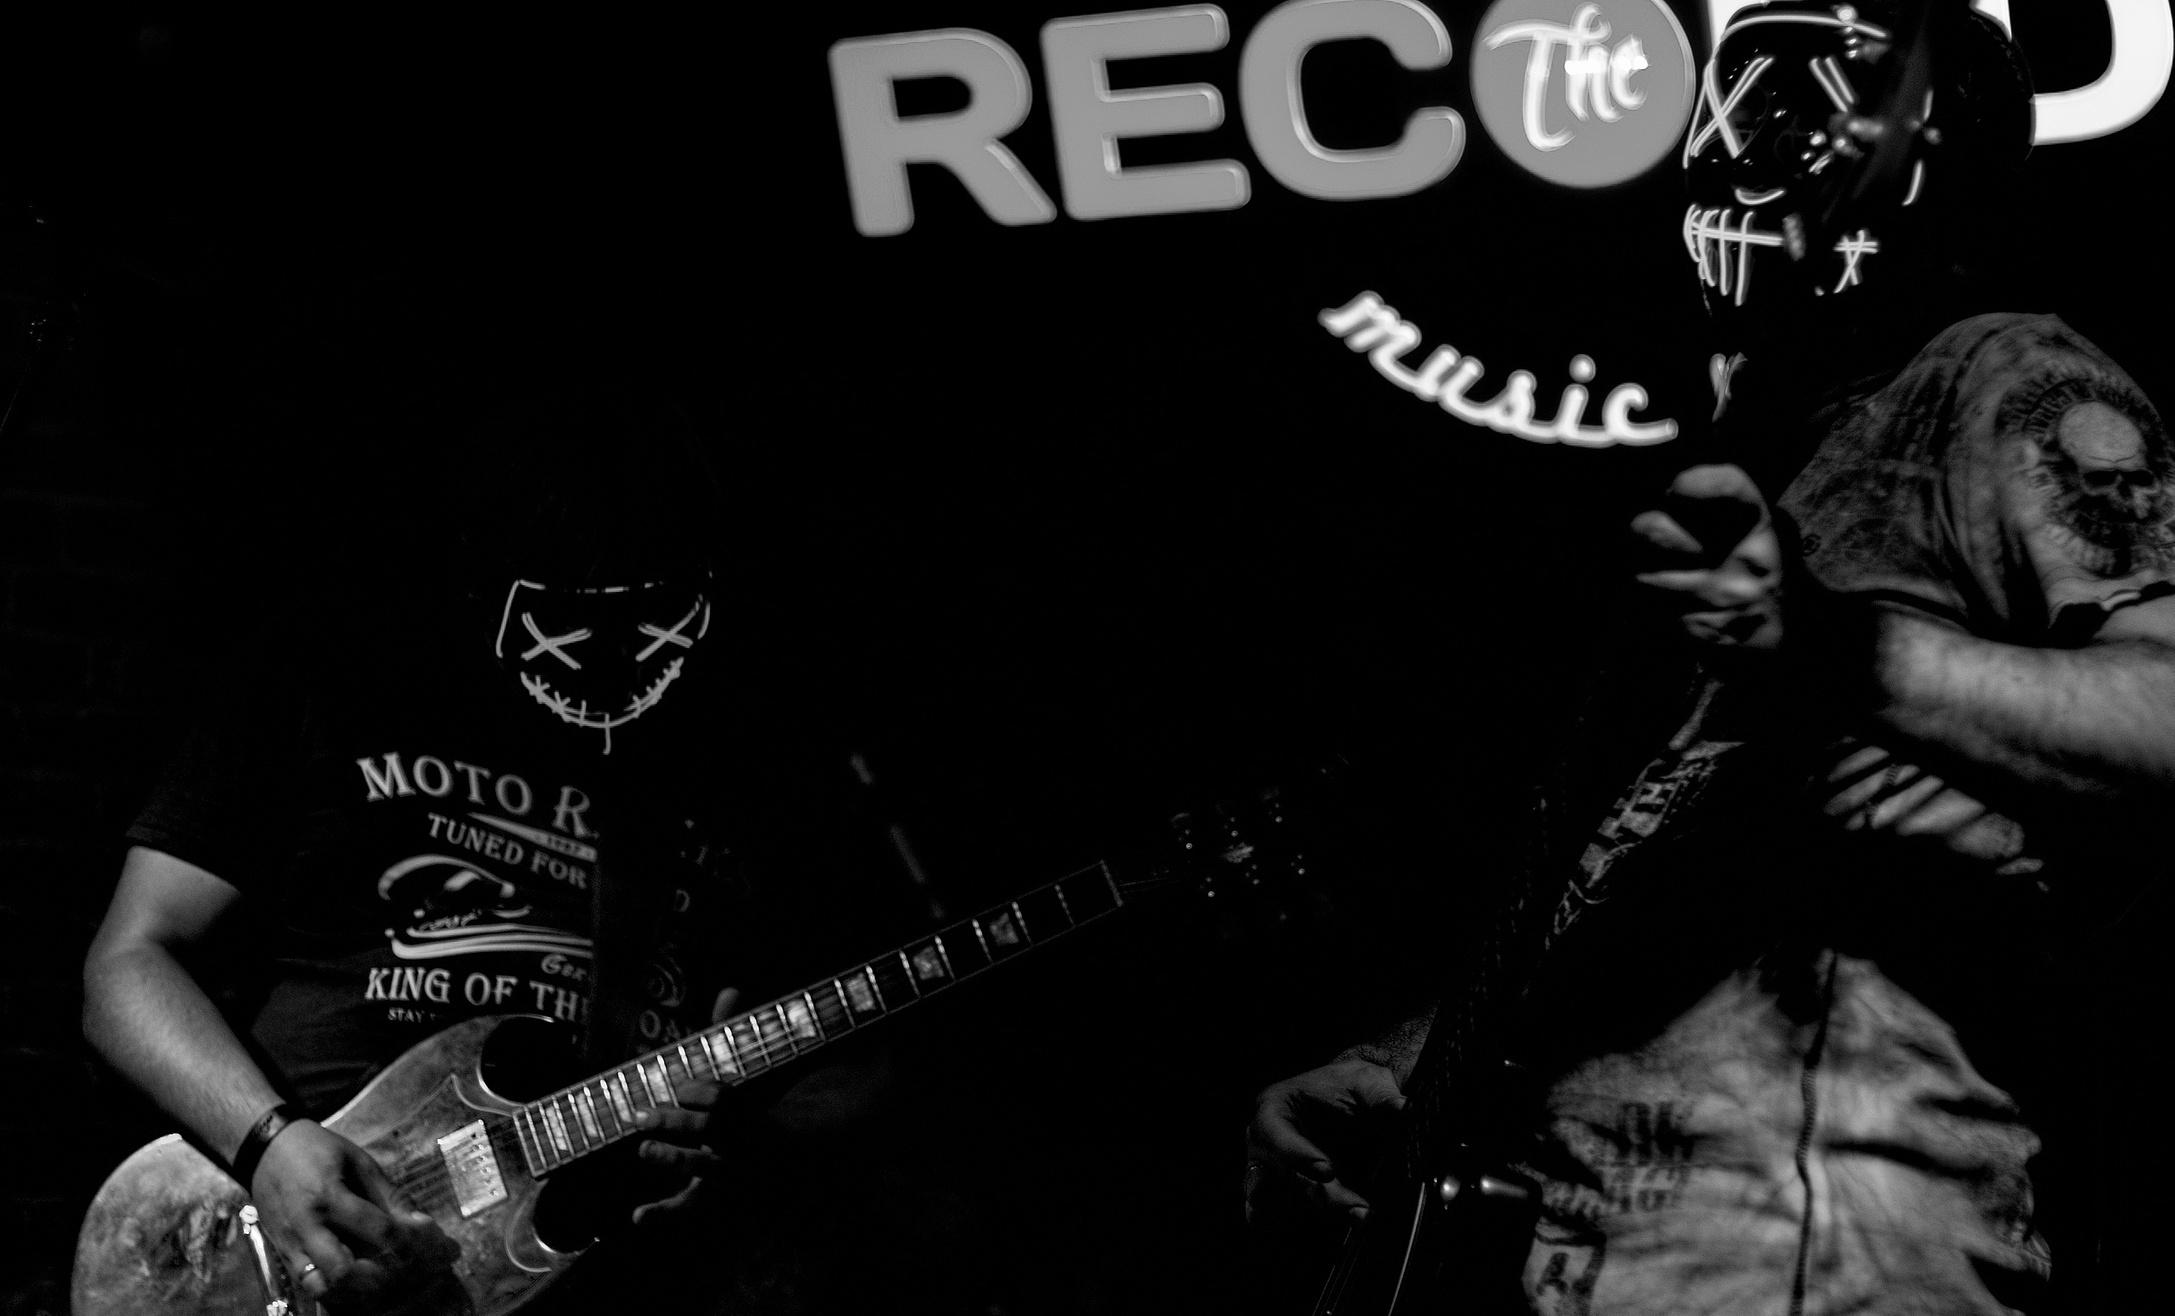 Фото: Records Music Pub